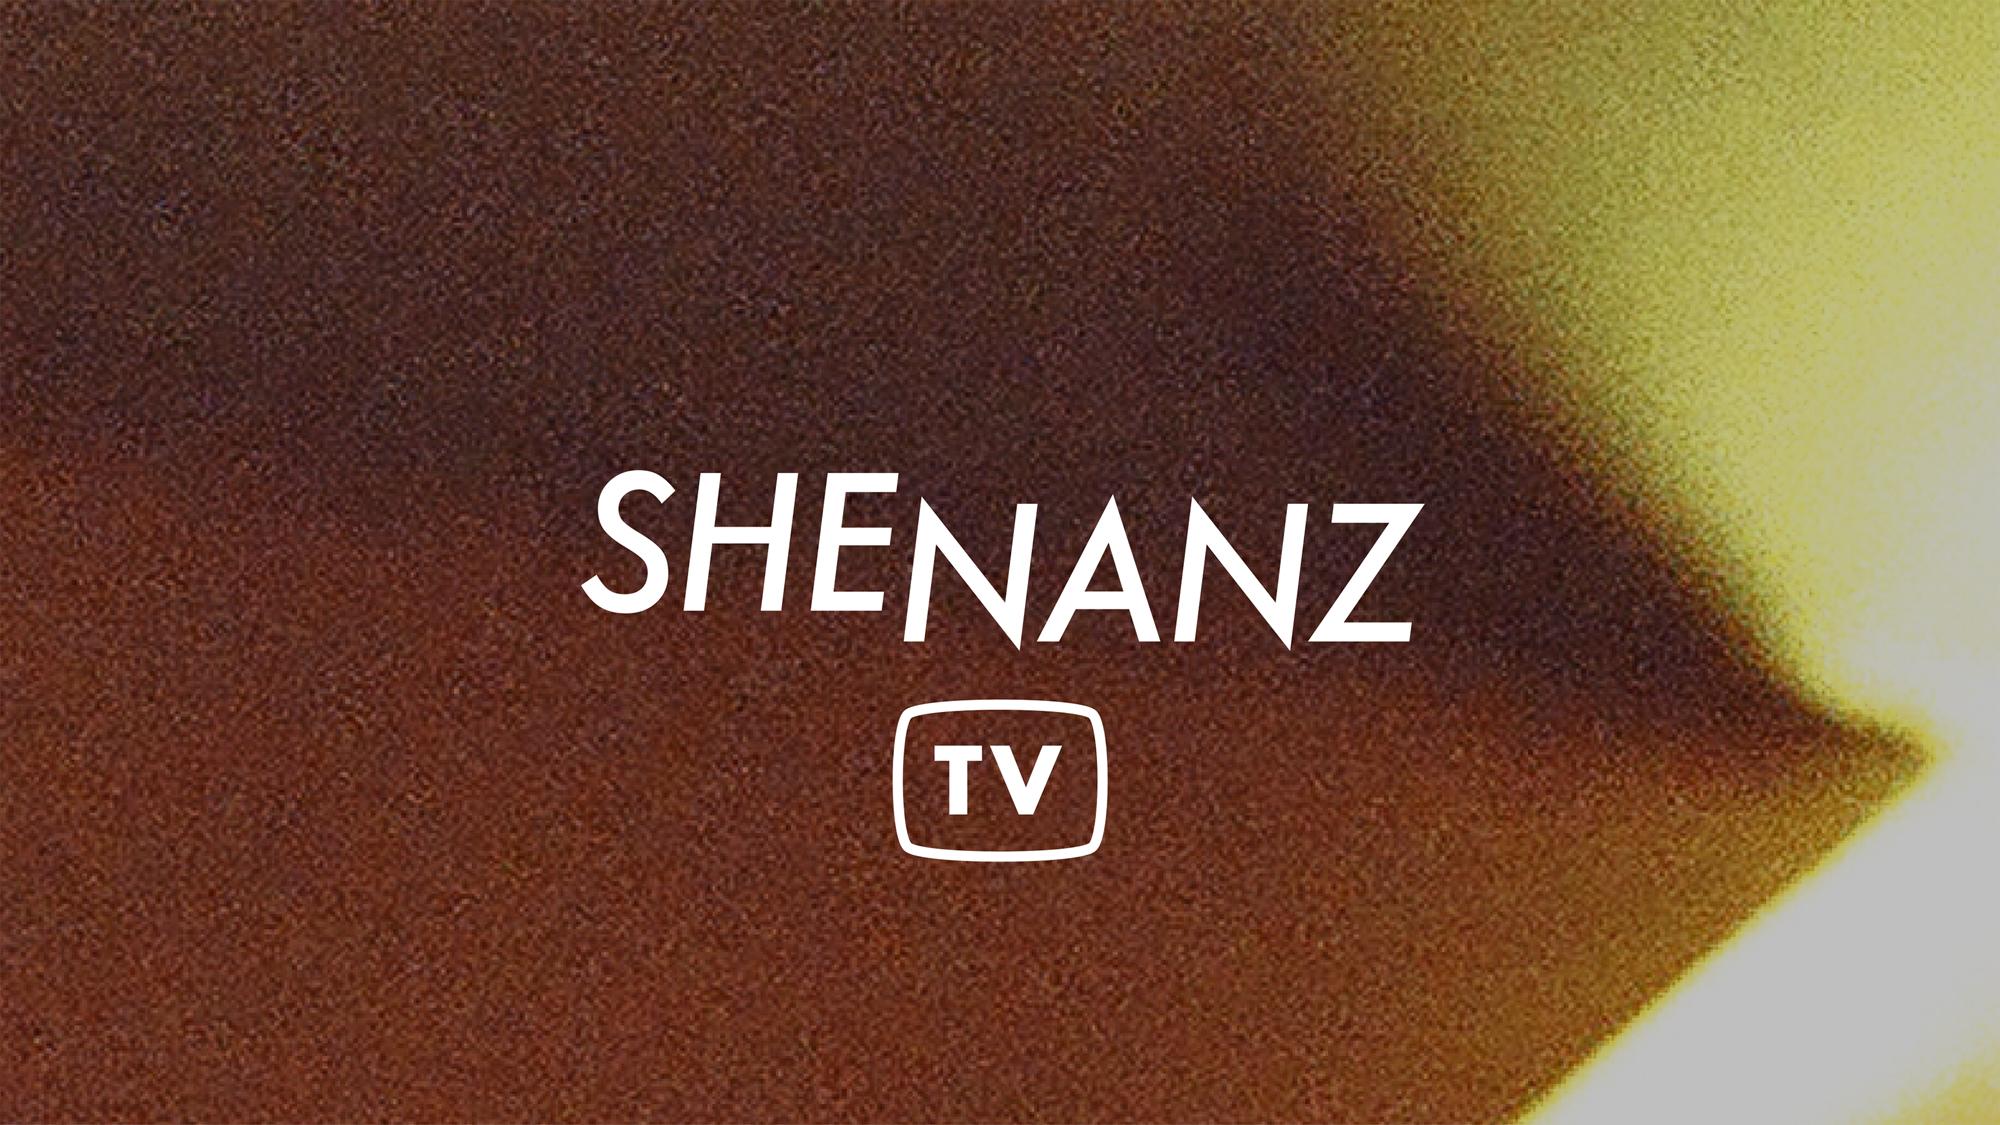 Shenanz TV